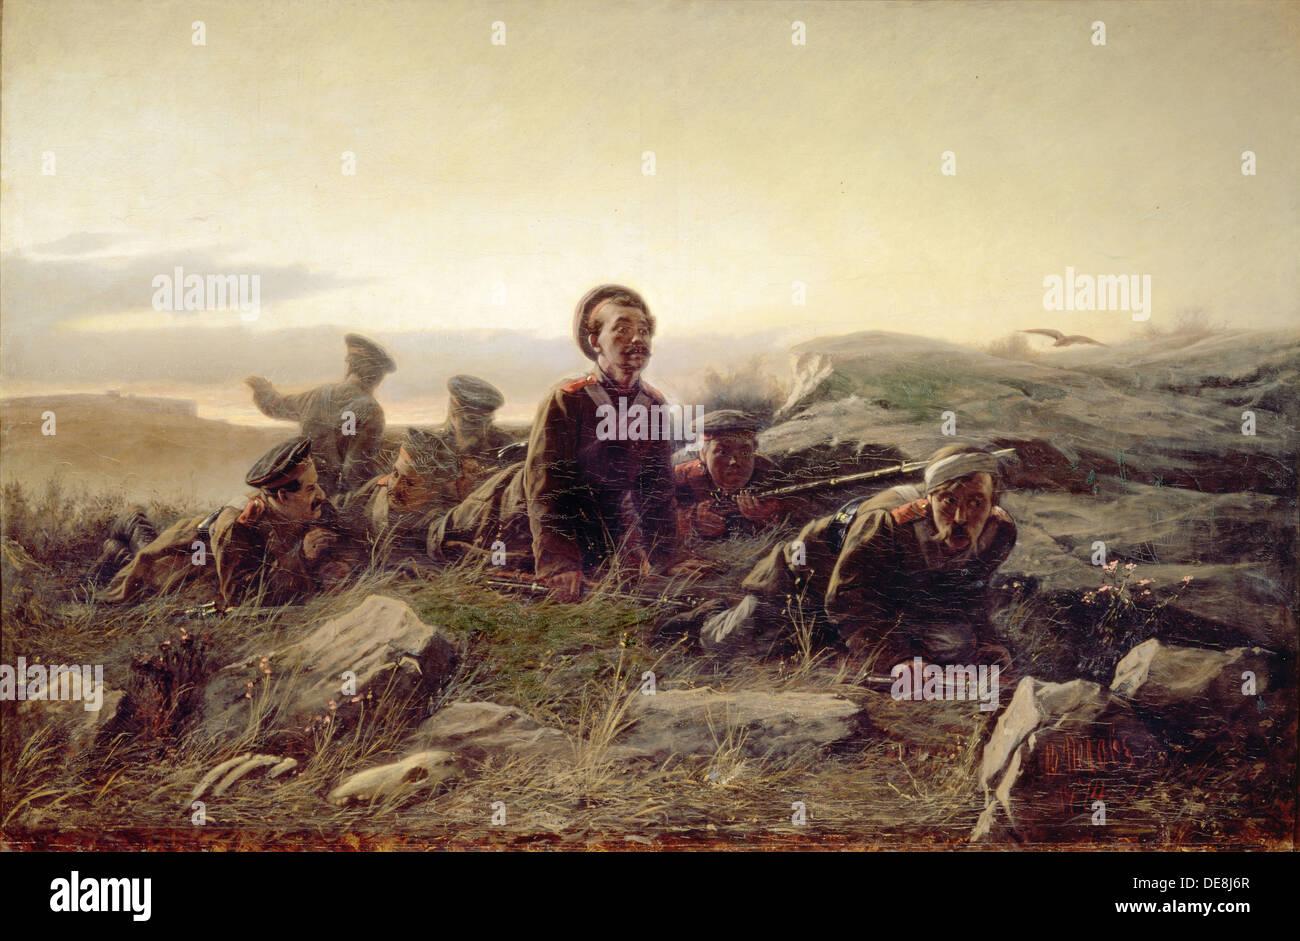 Plastuns at Sevastopol, 1874. Artist: Perov, Vasili Grigoryevich (1834-1882) - Stock Image